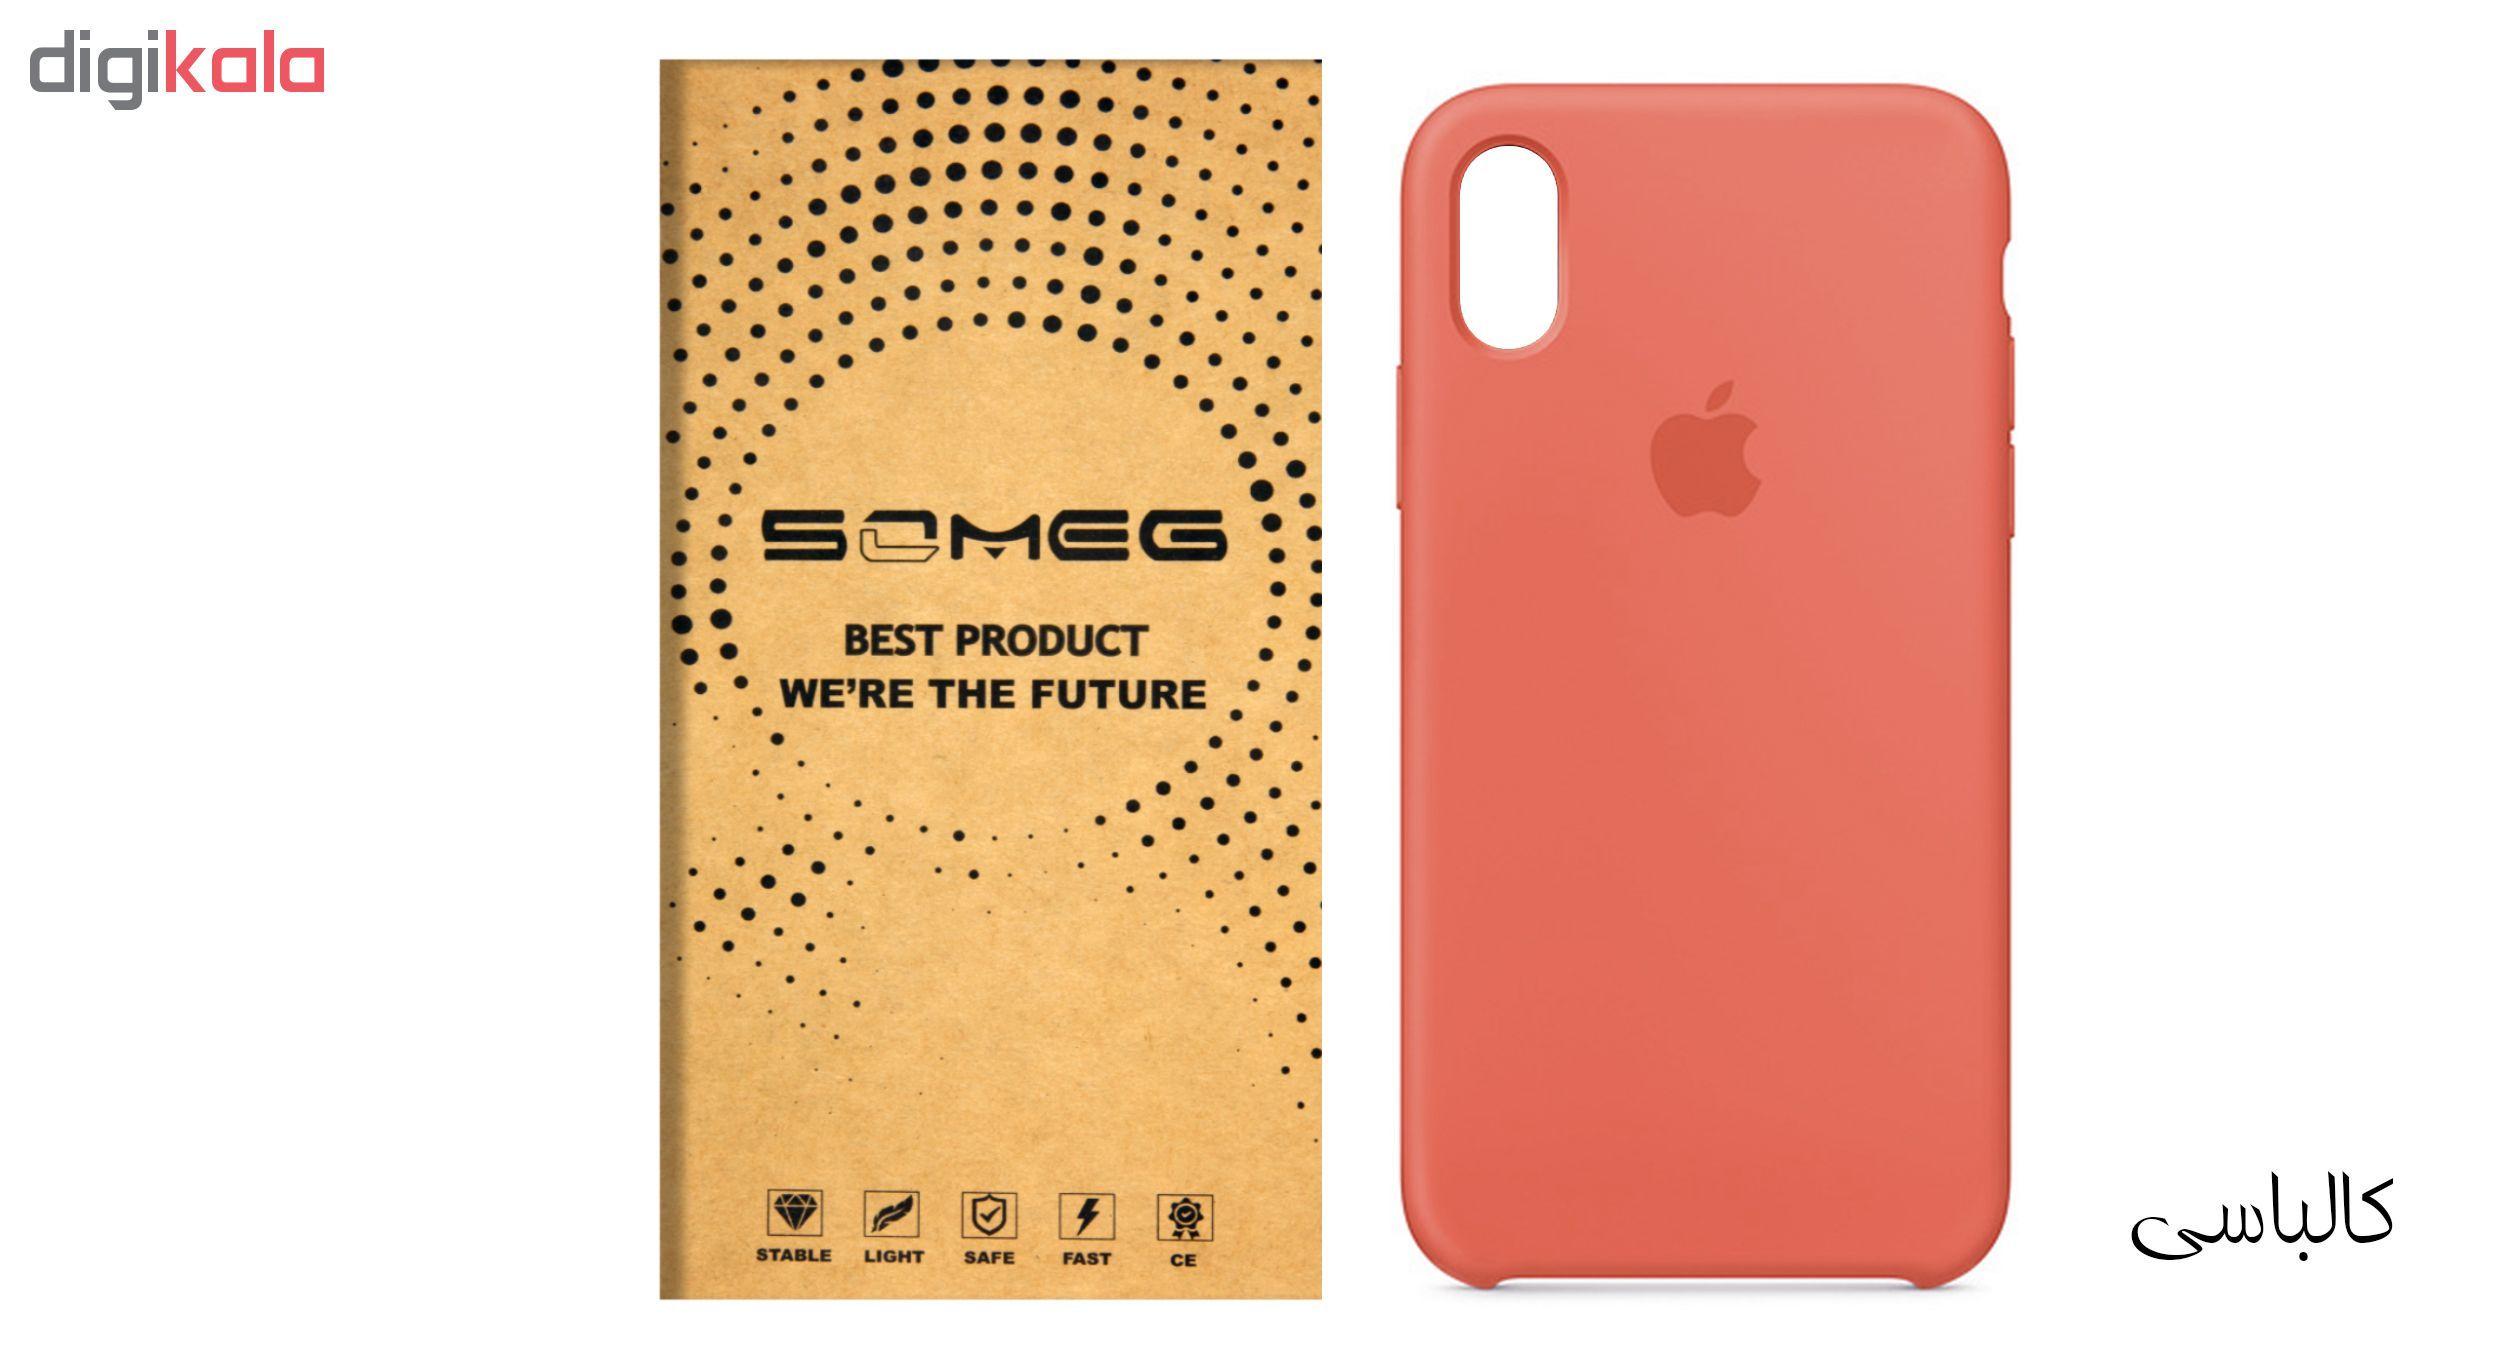 کاور سومگ مدل SIC مناسب برای گوشی موبایل اپل iPhone X  main 1 25